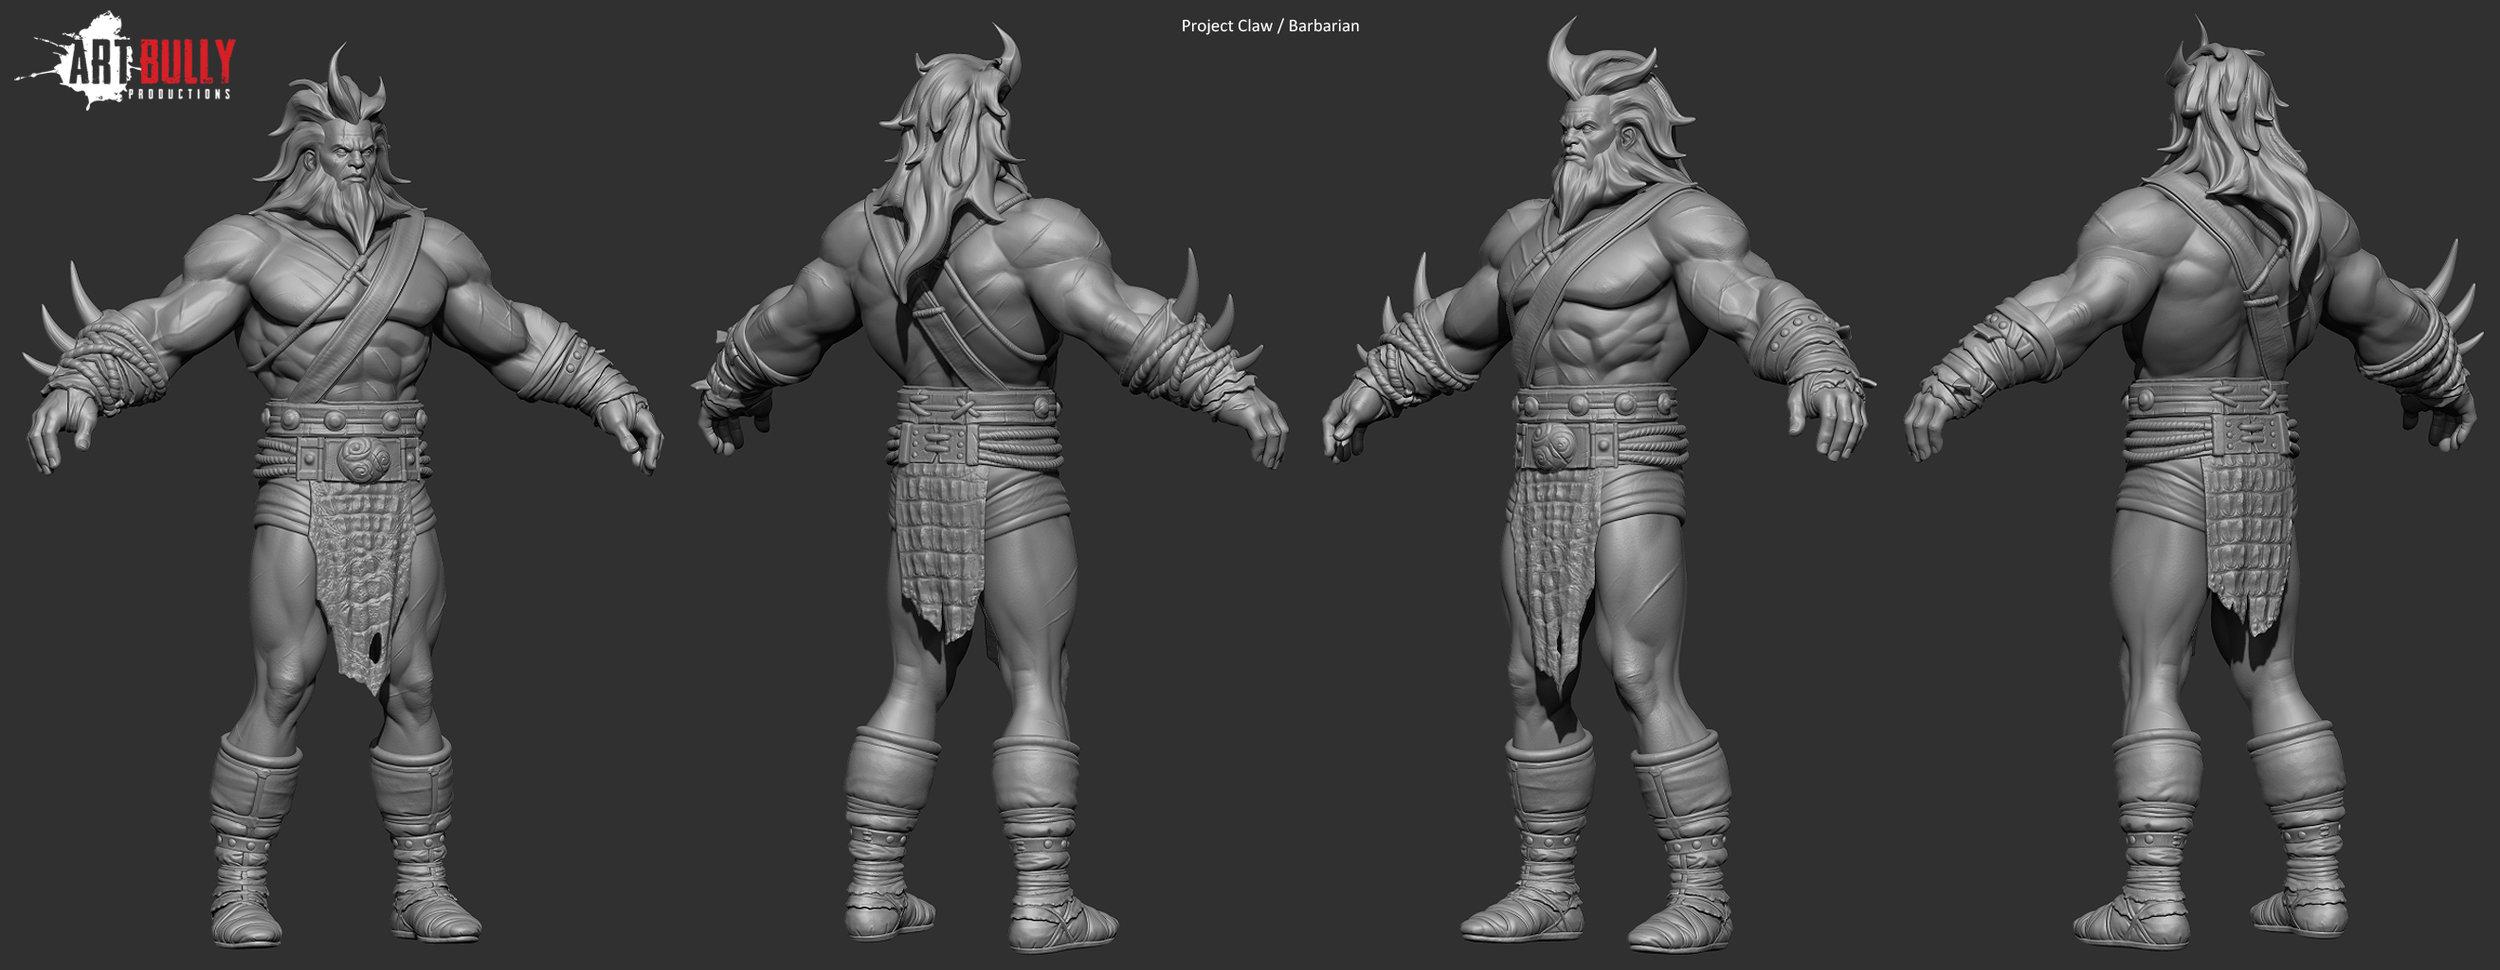 Barbarian_Sculpt_Render_01.jpg